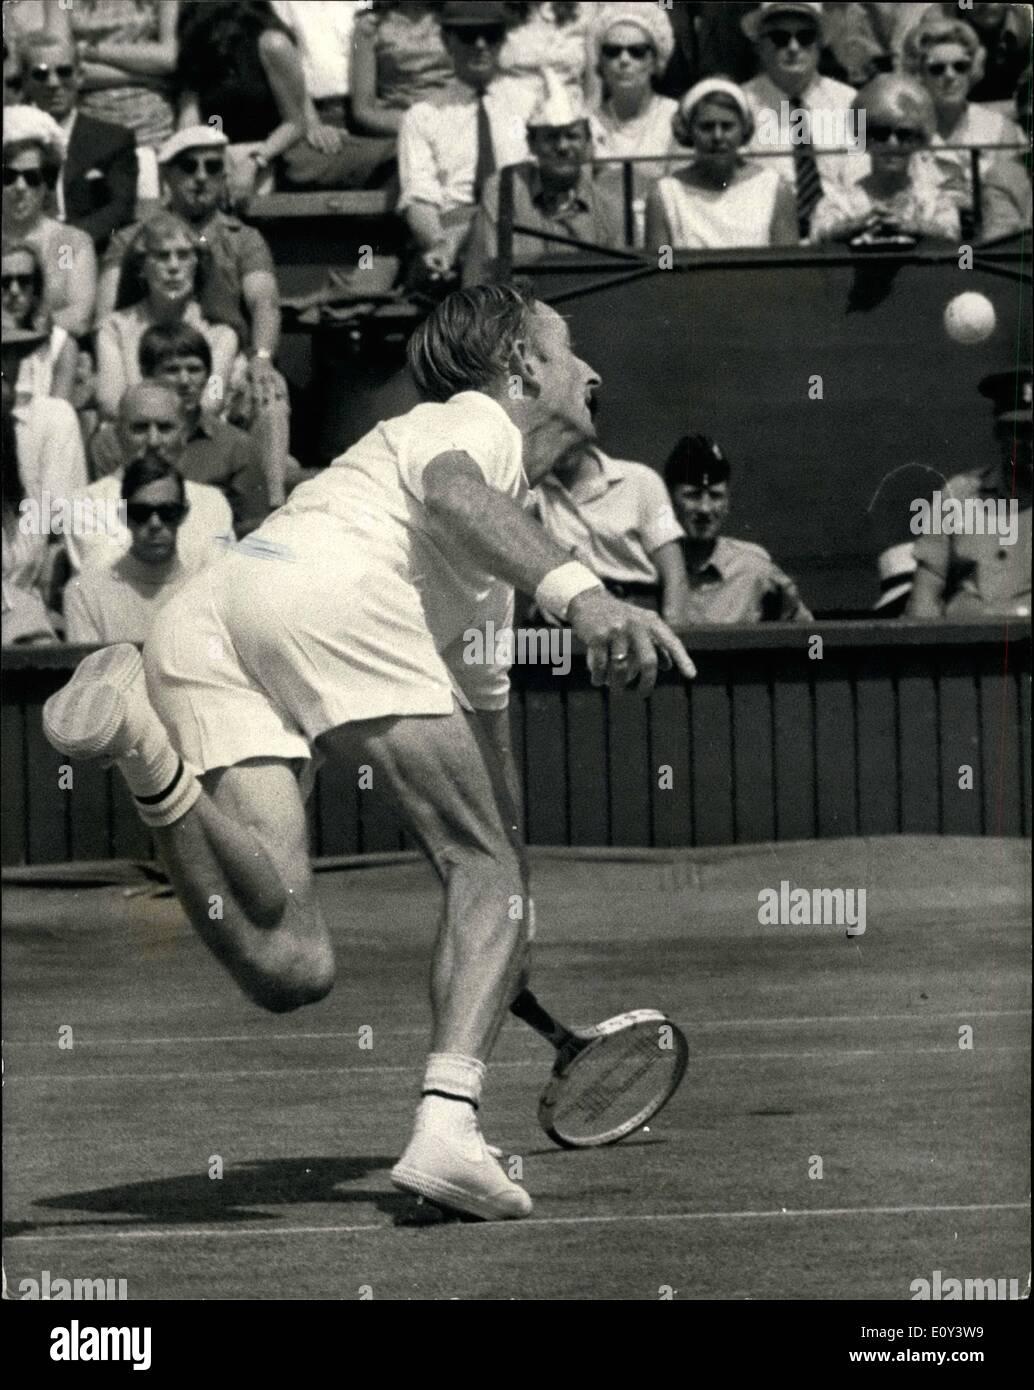 single gay men in wimbledon Wimbledon us open australian open french open atp tour fed cup wta tour davis cup italy  home » tennis » wimbledon » wimbledon men's singles » winner ».